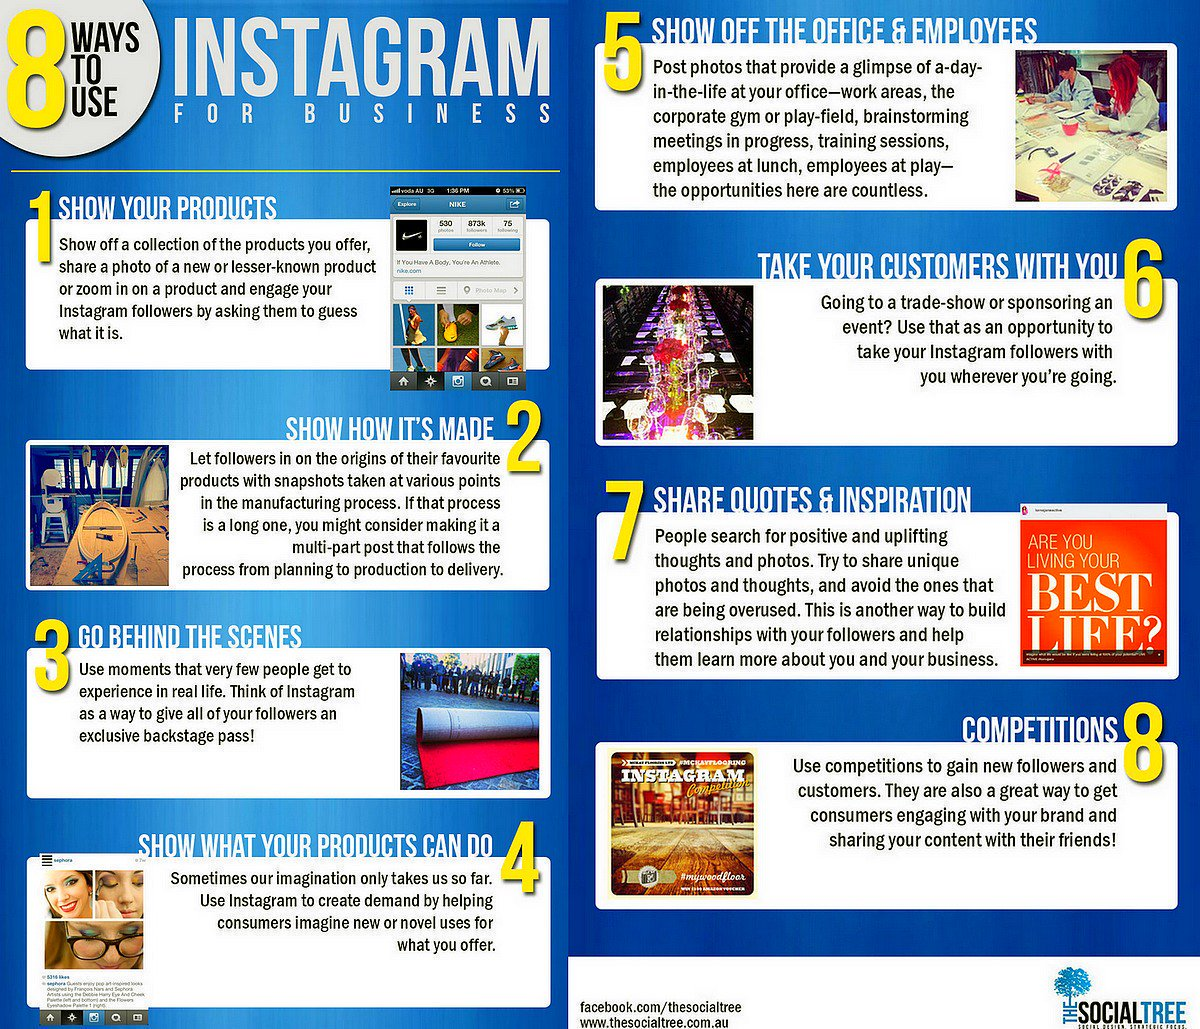 8 Ways To Use #Instagram For #Business [Infographic]  #SocialMedia #Marketing #SMM #DigitalMarketing #GrowthHacking<br>http://pic.twitter.com/vtGsb5KIKu